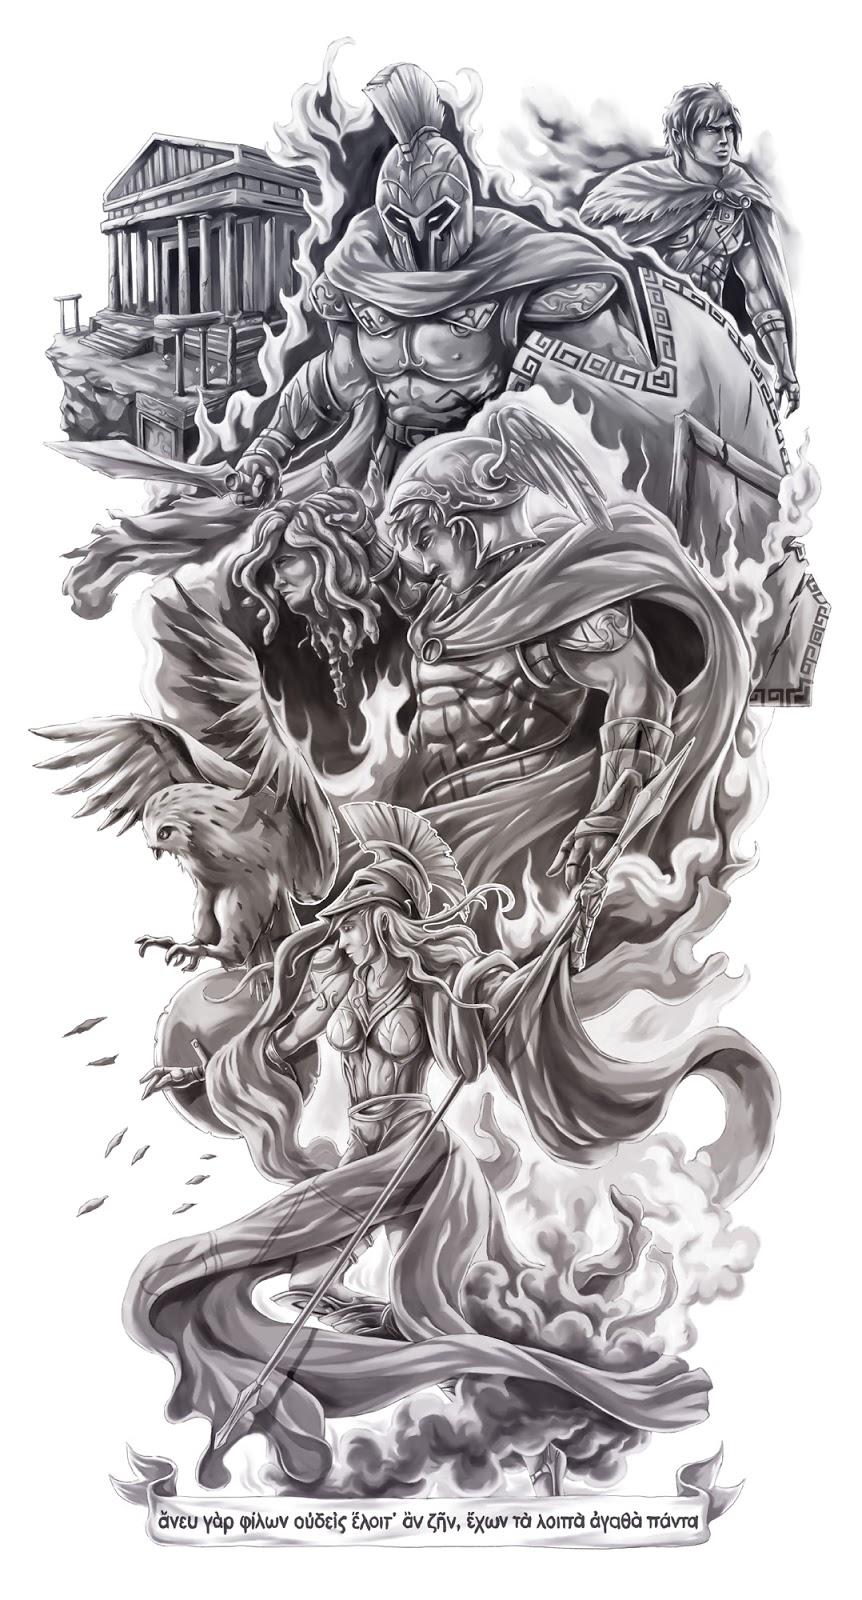 Custom tattoo, Tattoo designs and Artworks on Pinterest